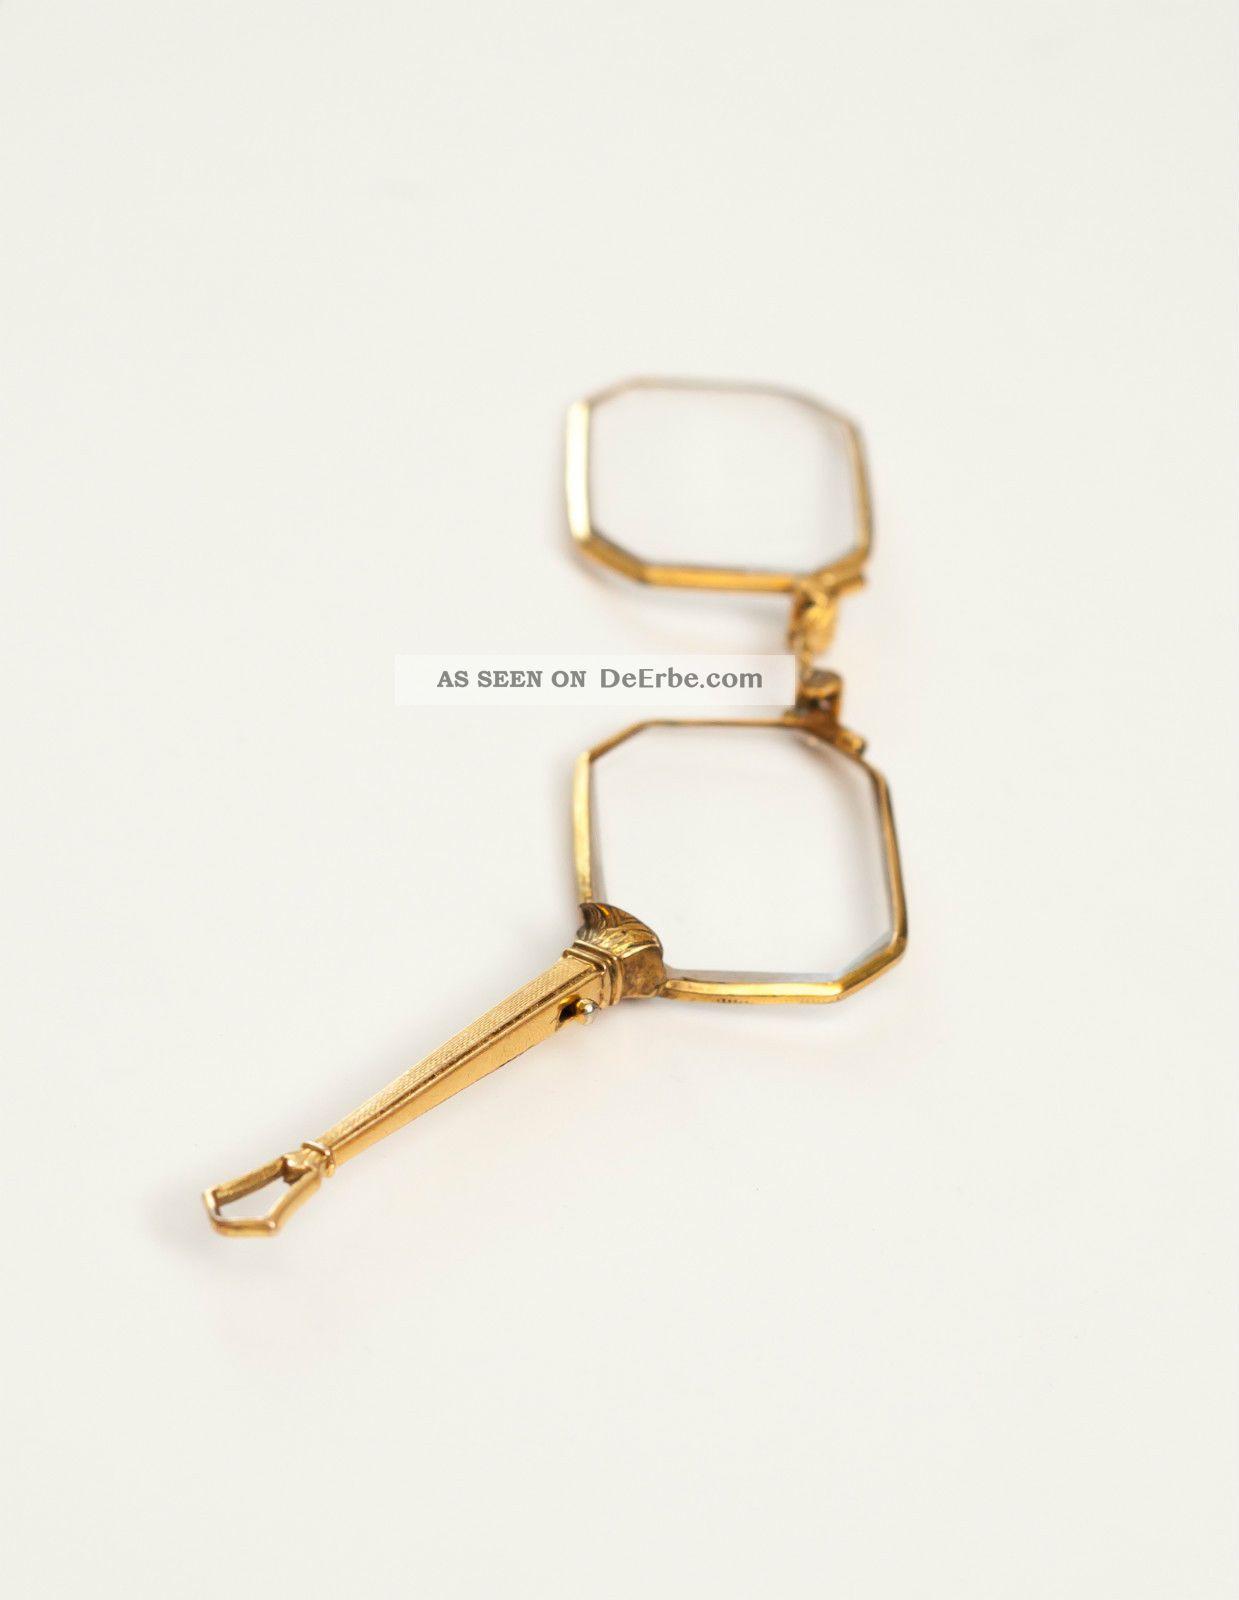 Klappbrille Lorgnon Lorgnette,  Alte Brille,  Rar & Antik Springlorgnette Accessoires Bild